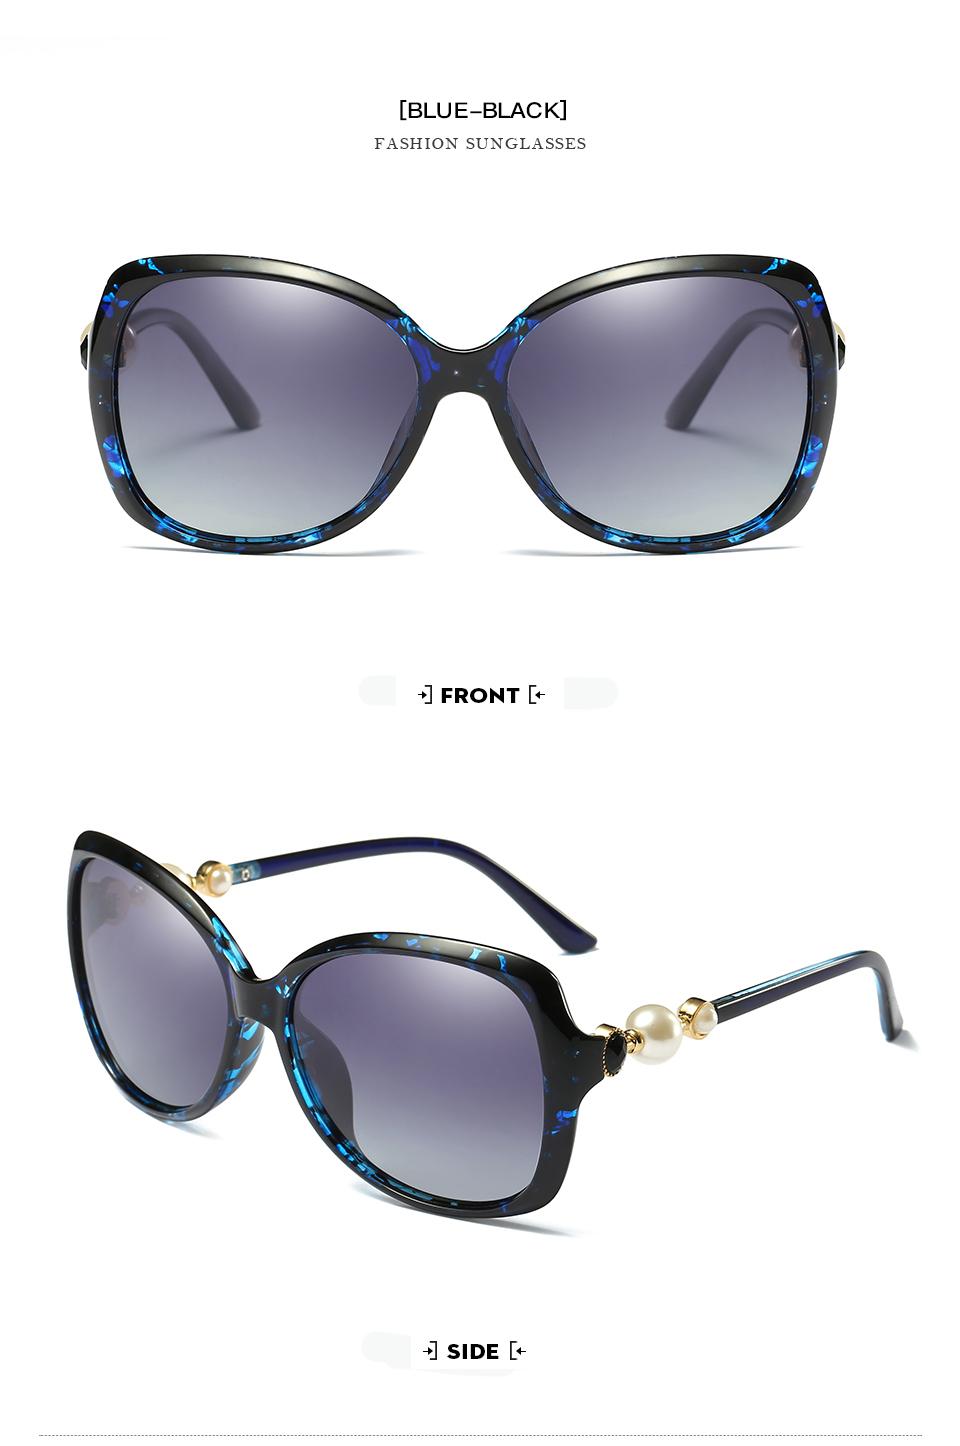 ₪Women Fashion Brand Designer Gradient ⊰ Sunglasses